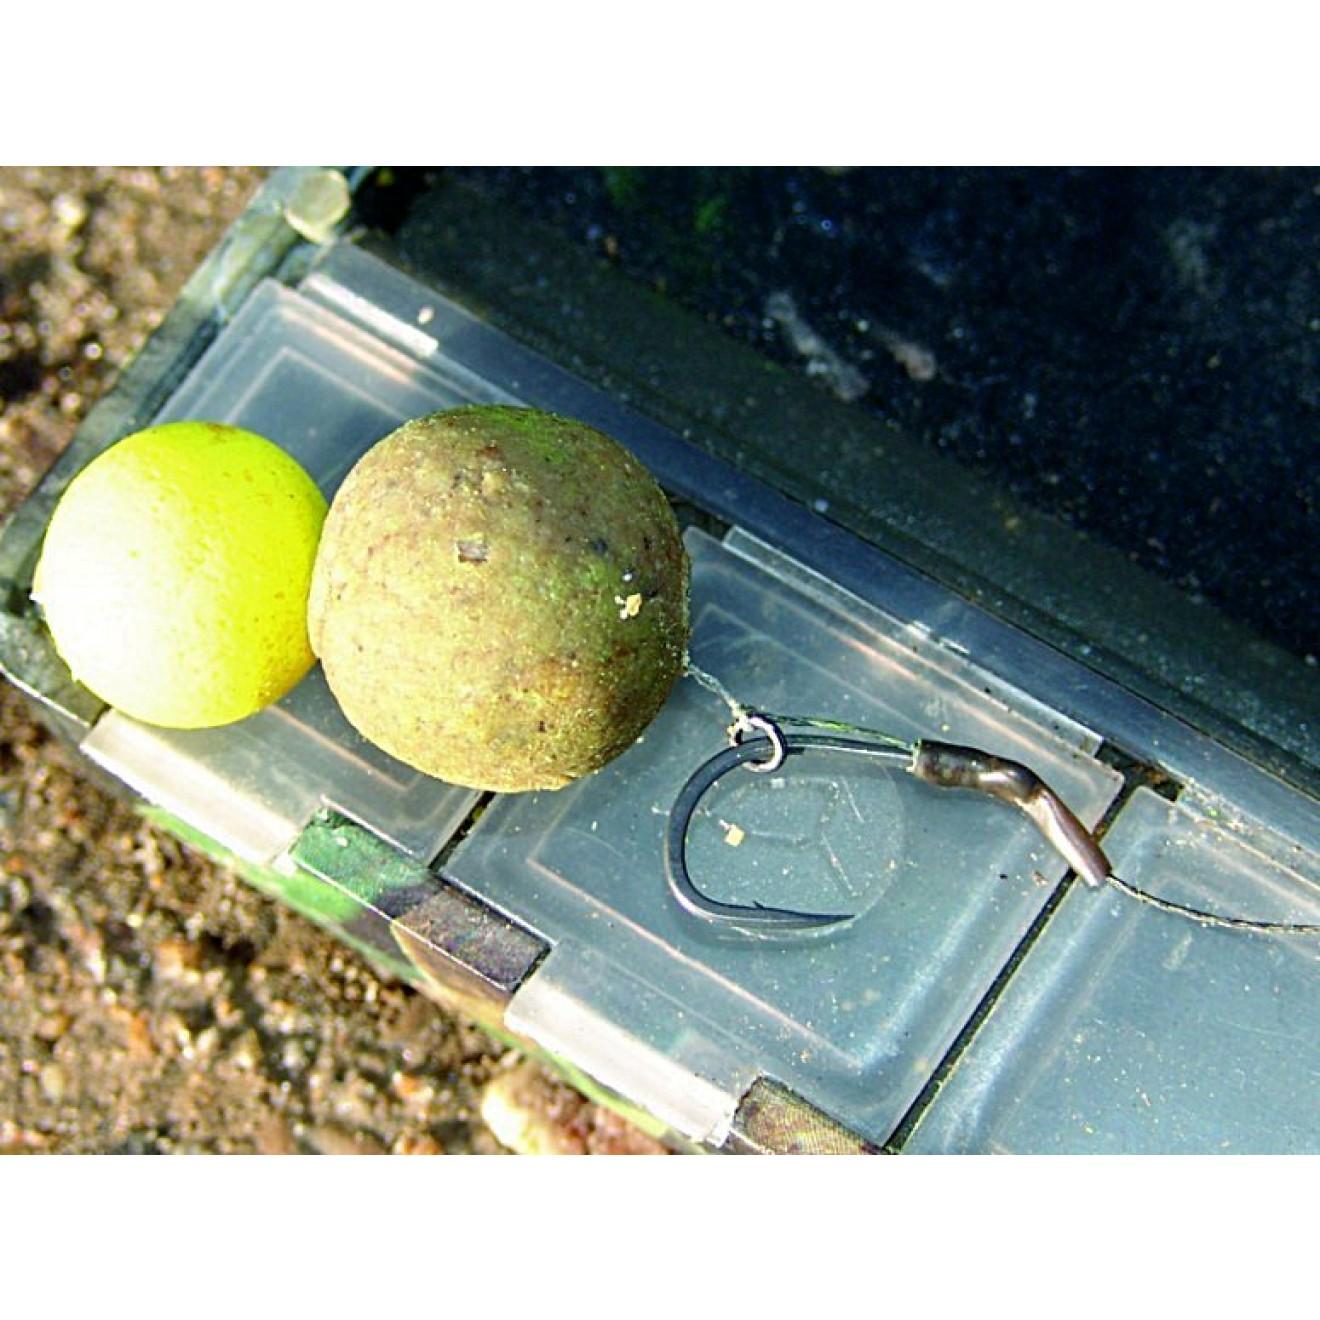 Boilies//richworth euro baits salmon supreme 1000g sachet 18mm